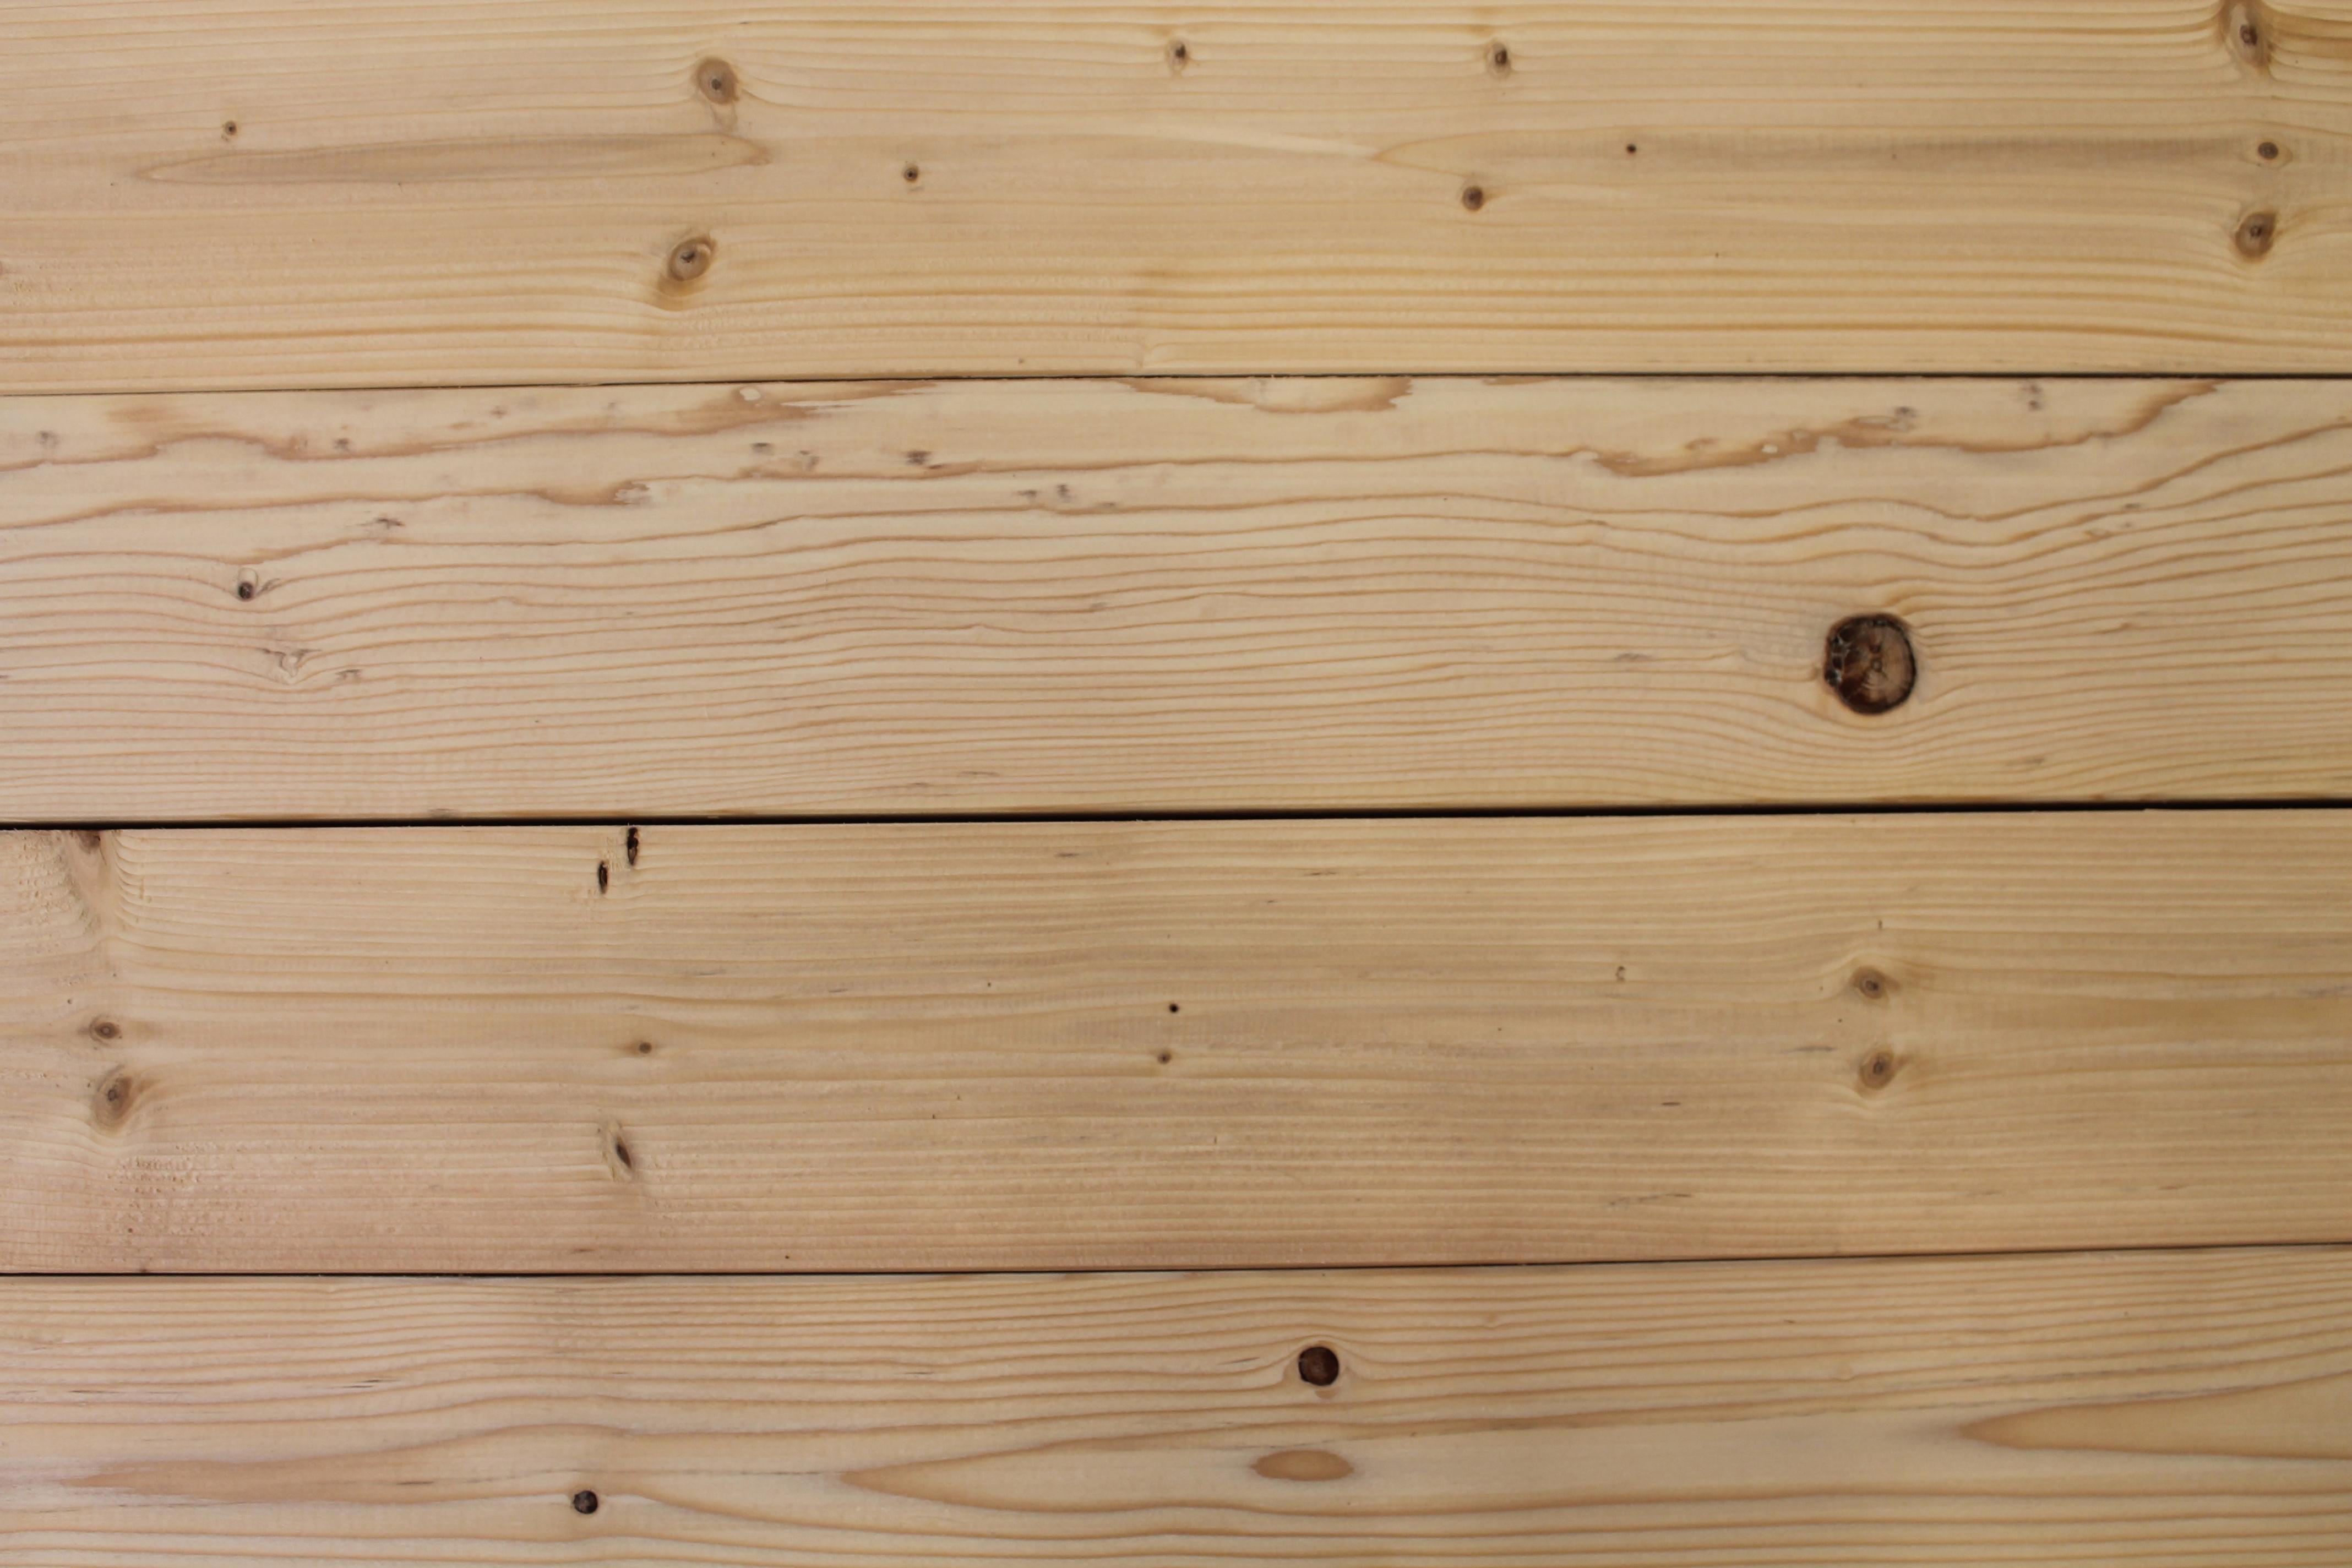 3x8 log siding hand hewn pine - Tight Knot Alaskan Pine